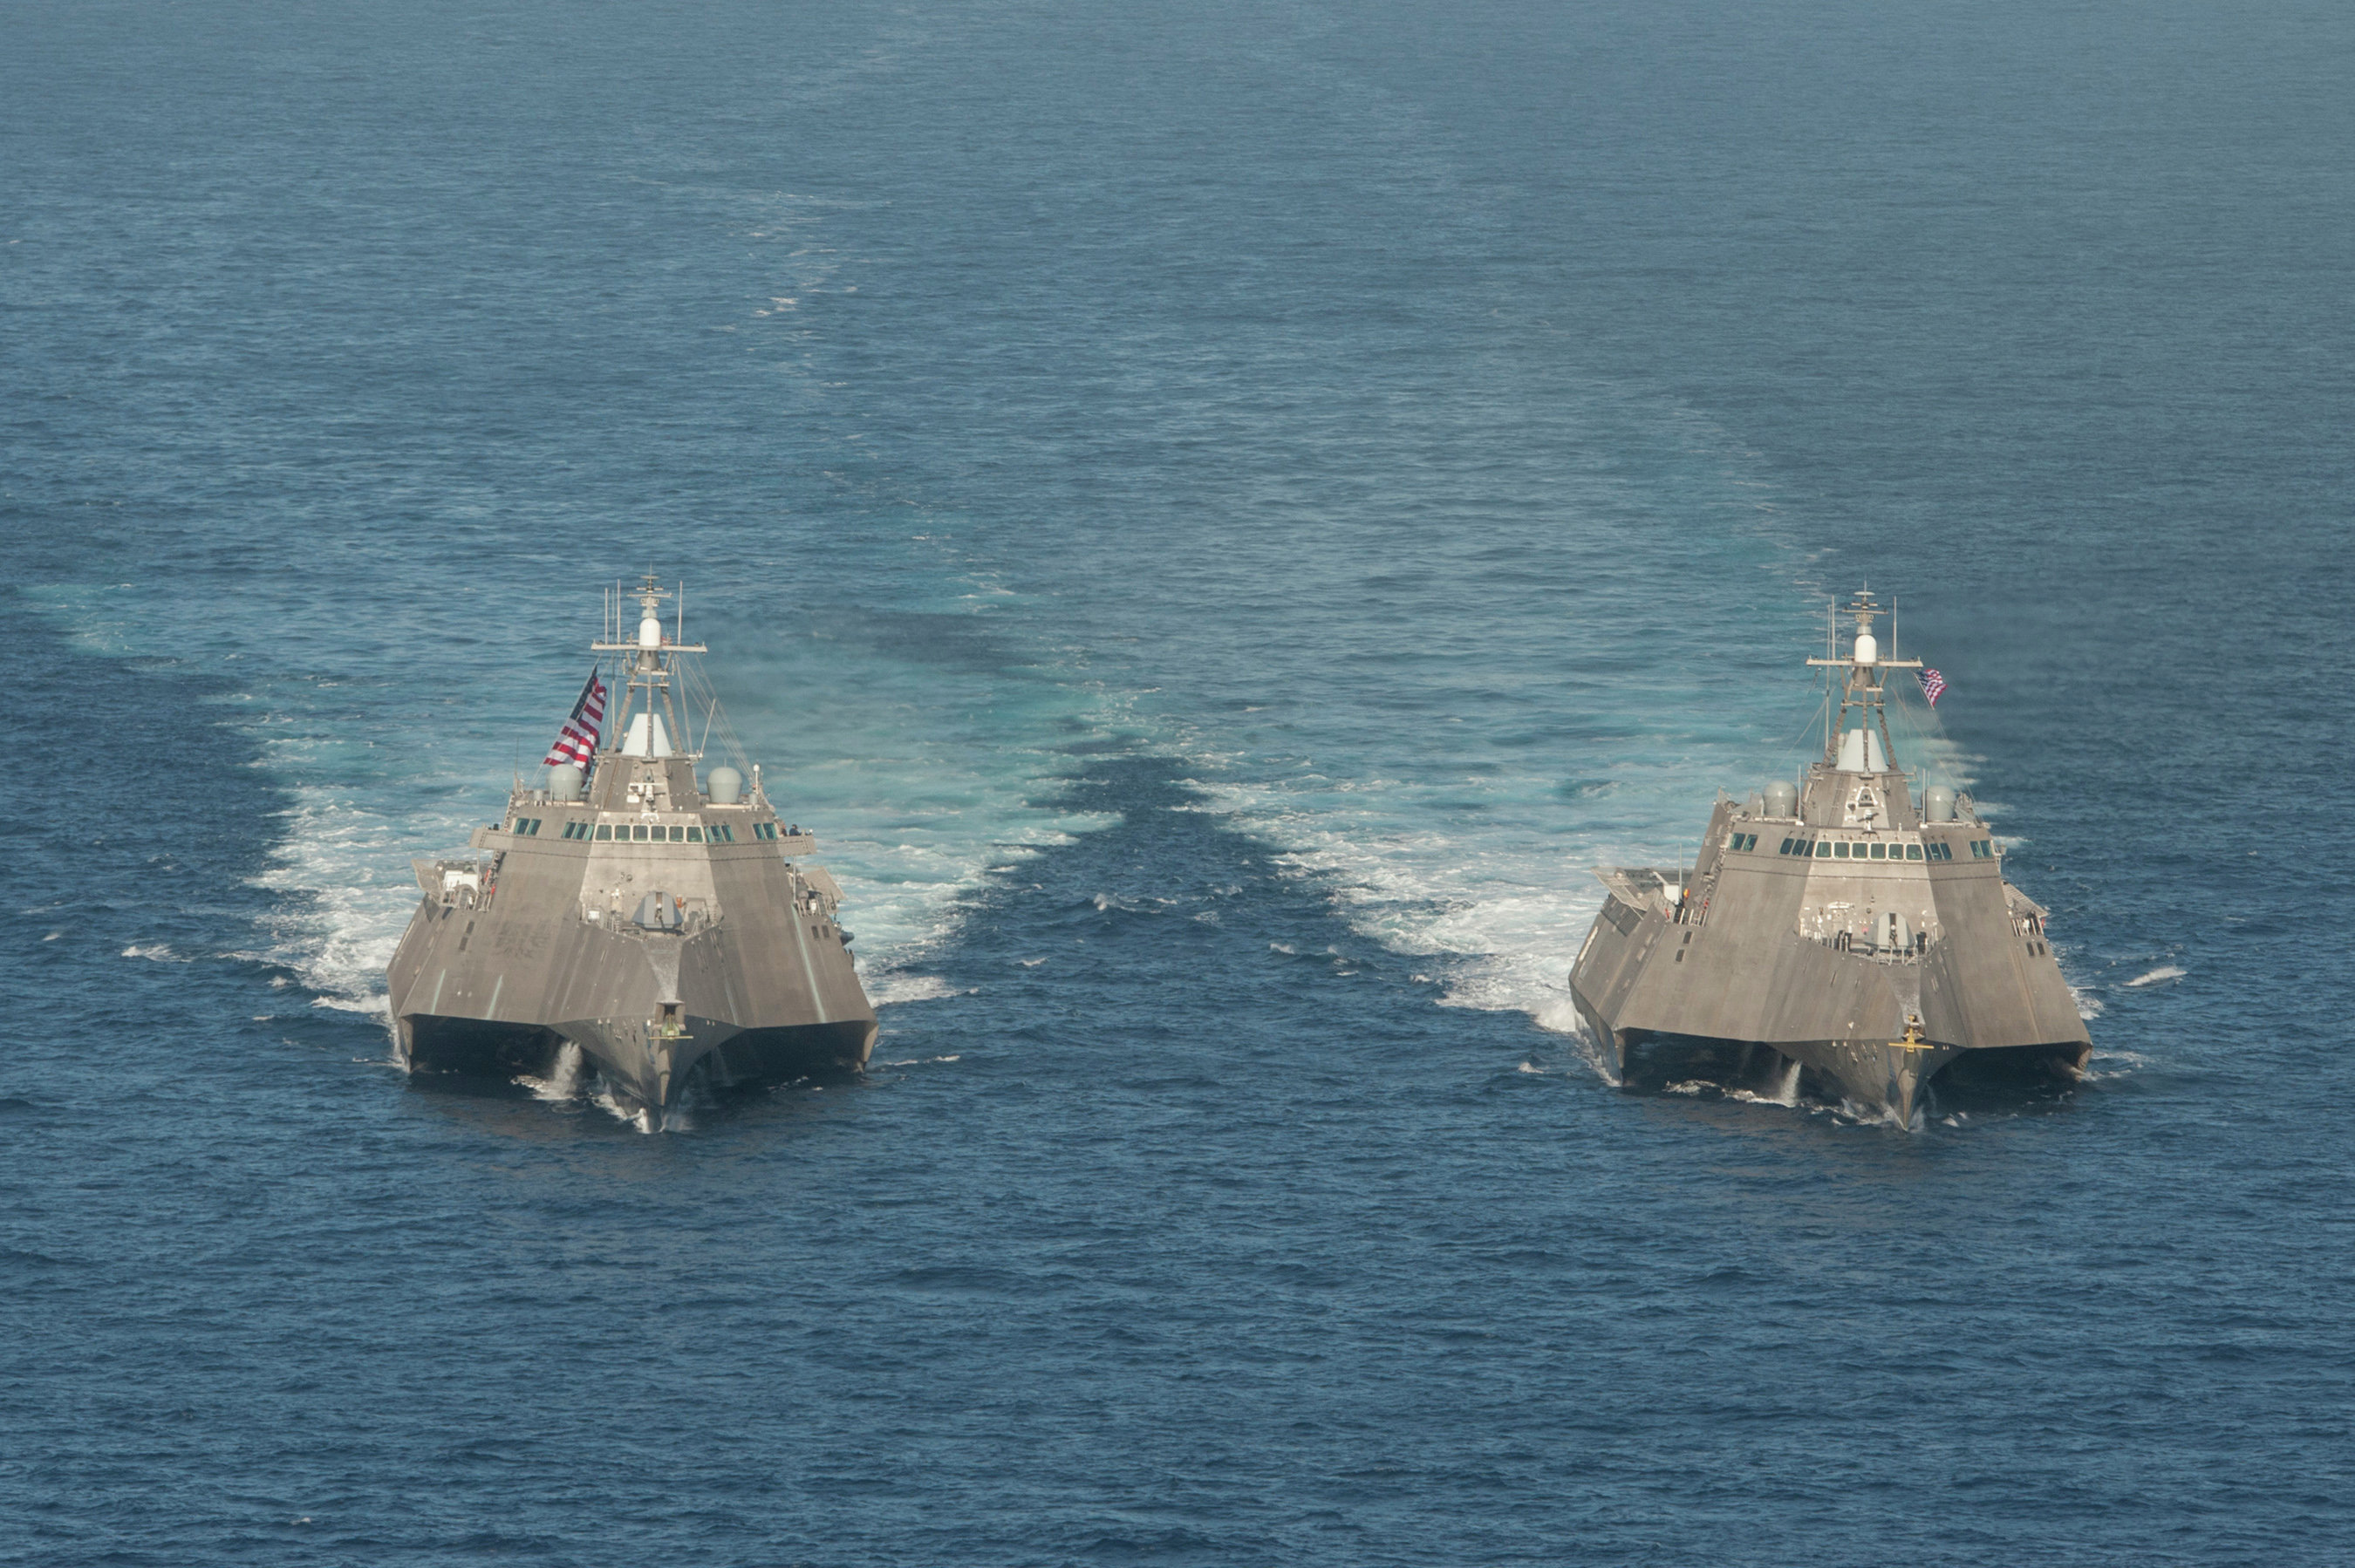 Buques de combate litoral estadounidenses USS Independence (LCS 2), izda., y USS Coronado (LCS 4), drcha.